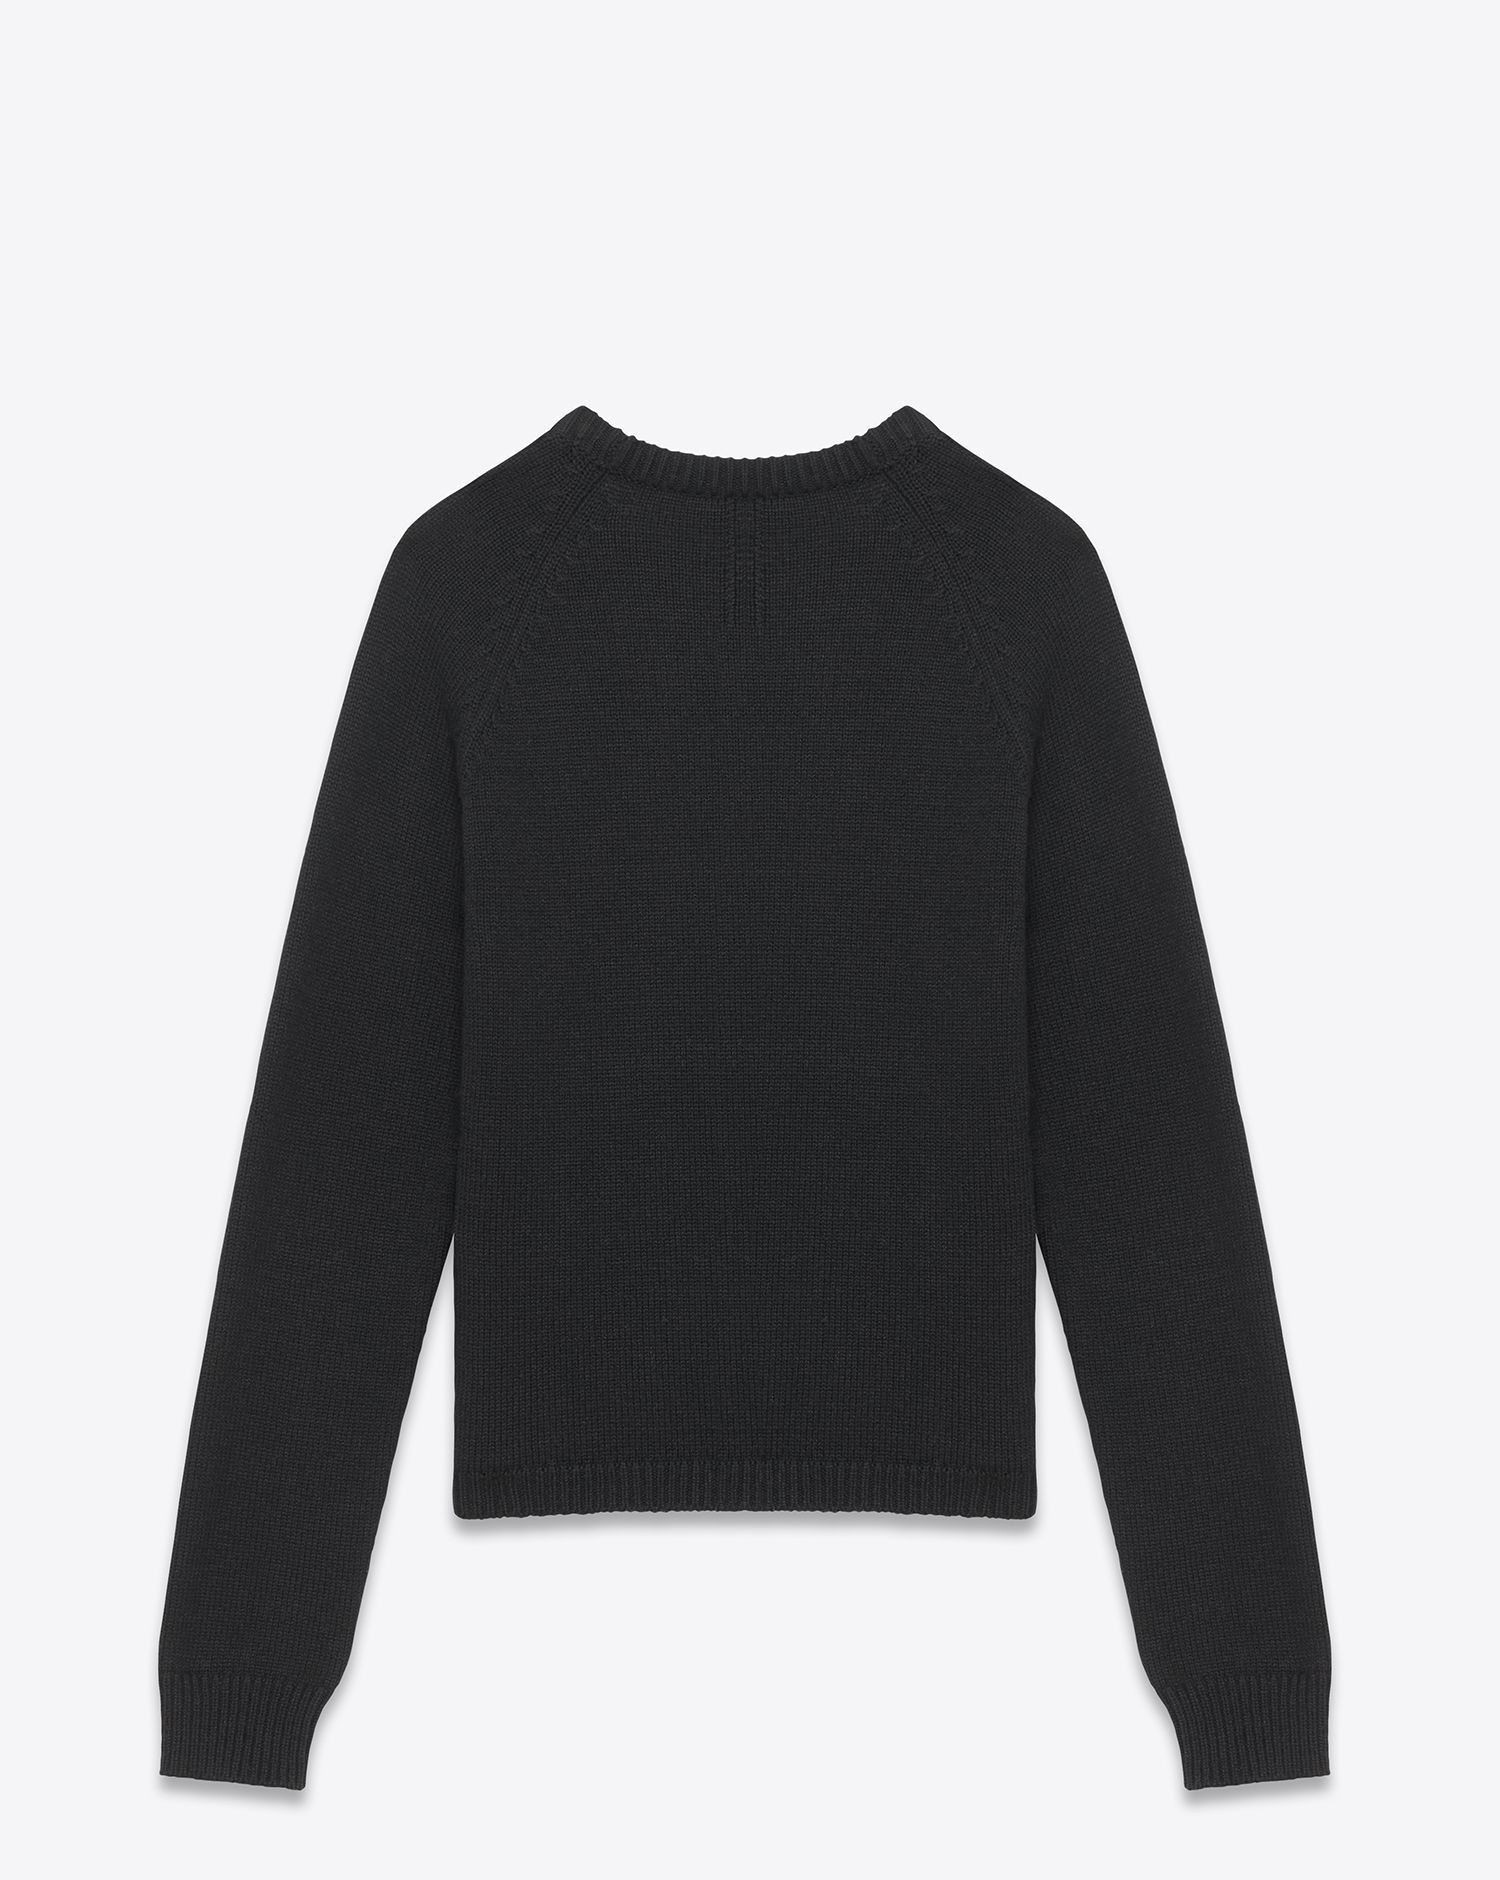 66ad1642585f76 Saint Laurent Classic Crewneck Sweater In Black Merino Wool note open  stitch at neck